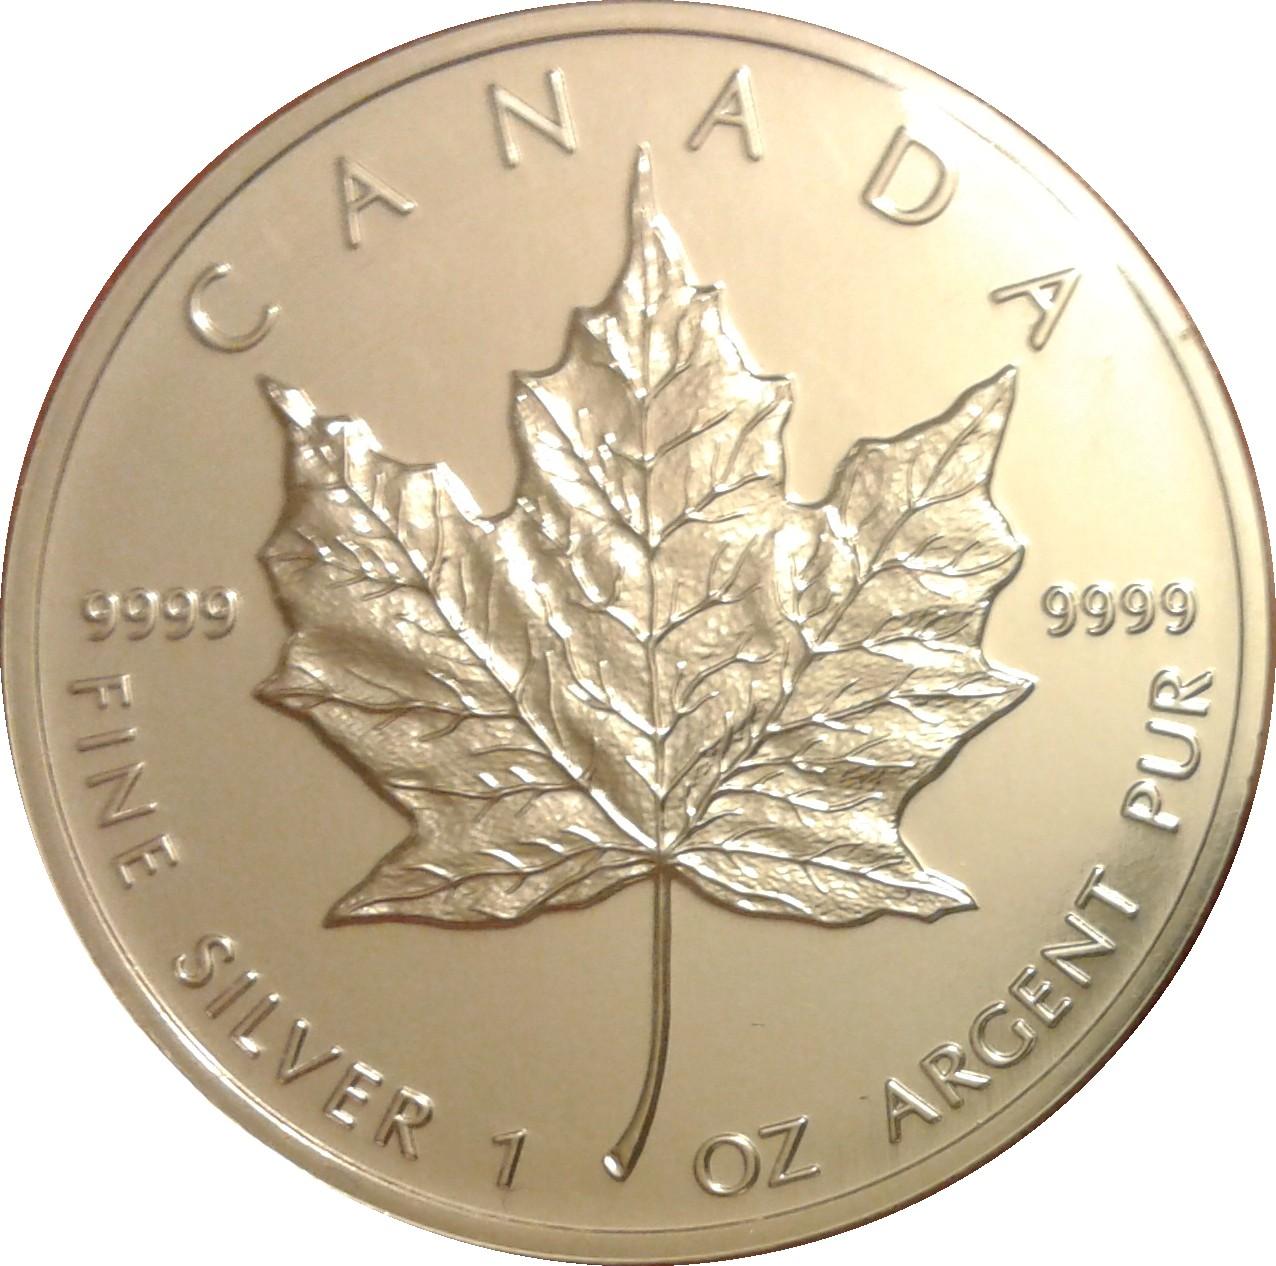 Elizabeth Ii 5 Dollar Silver Coin 2000 - New Dollar Wallpaper HD Noeimage.Org